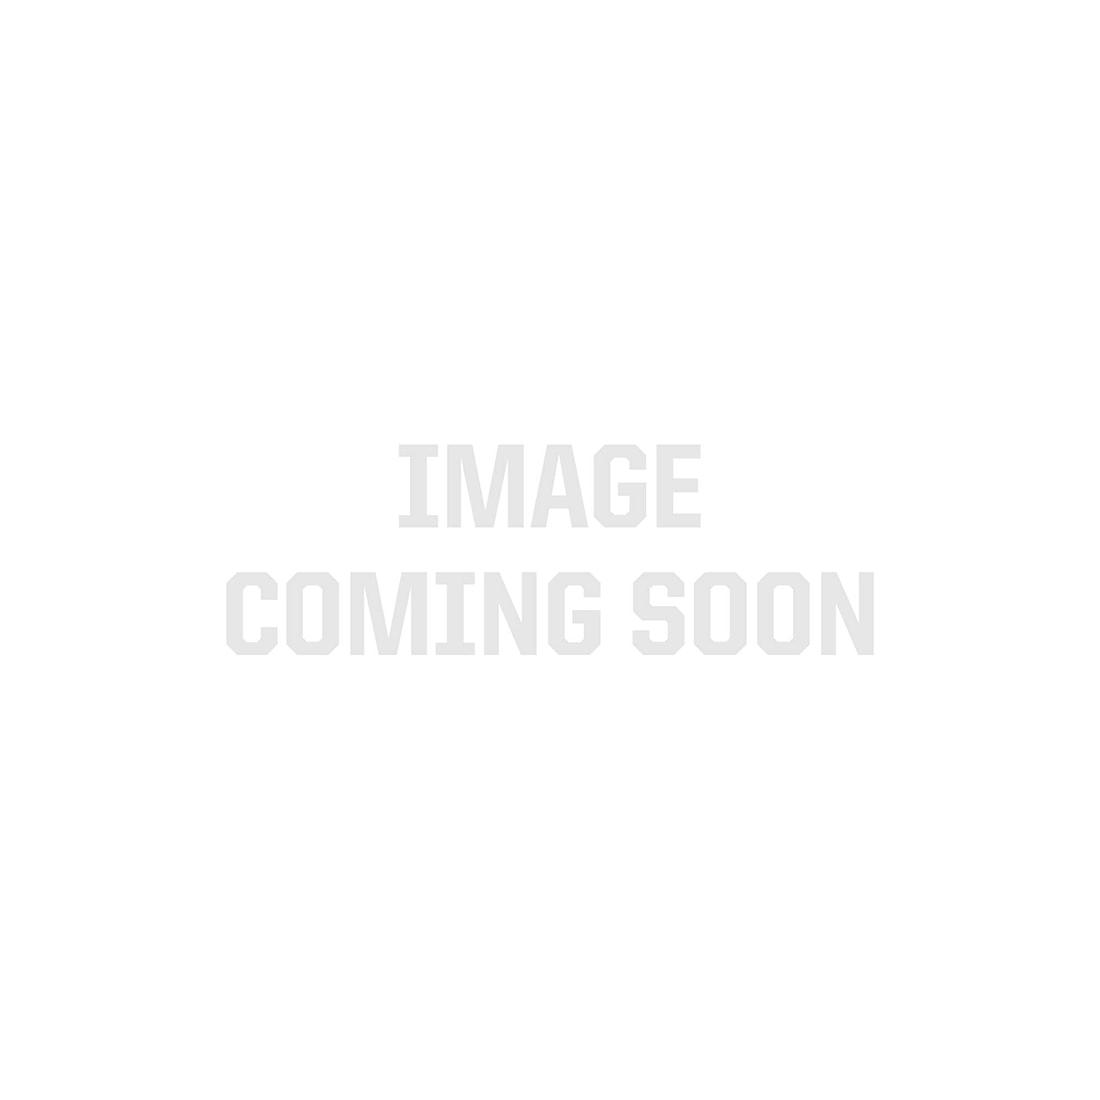 Soft White 2216 TruColor LED Strip Light, 60/m, 8mm wide, Sample Kit